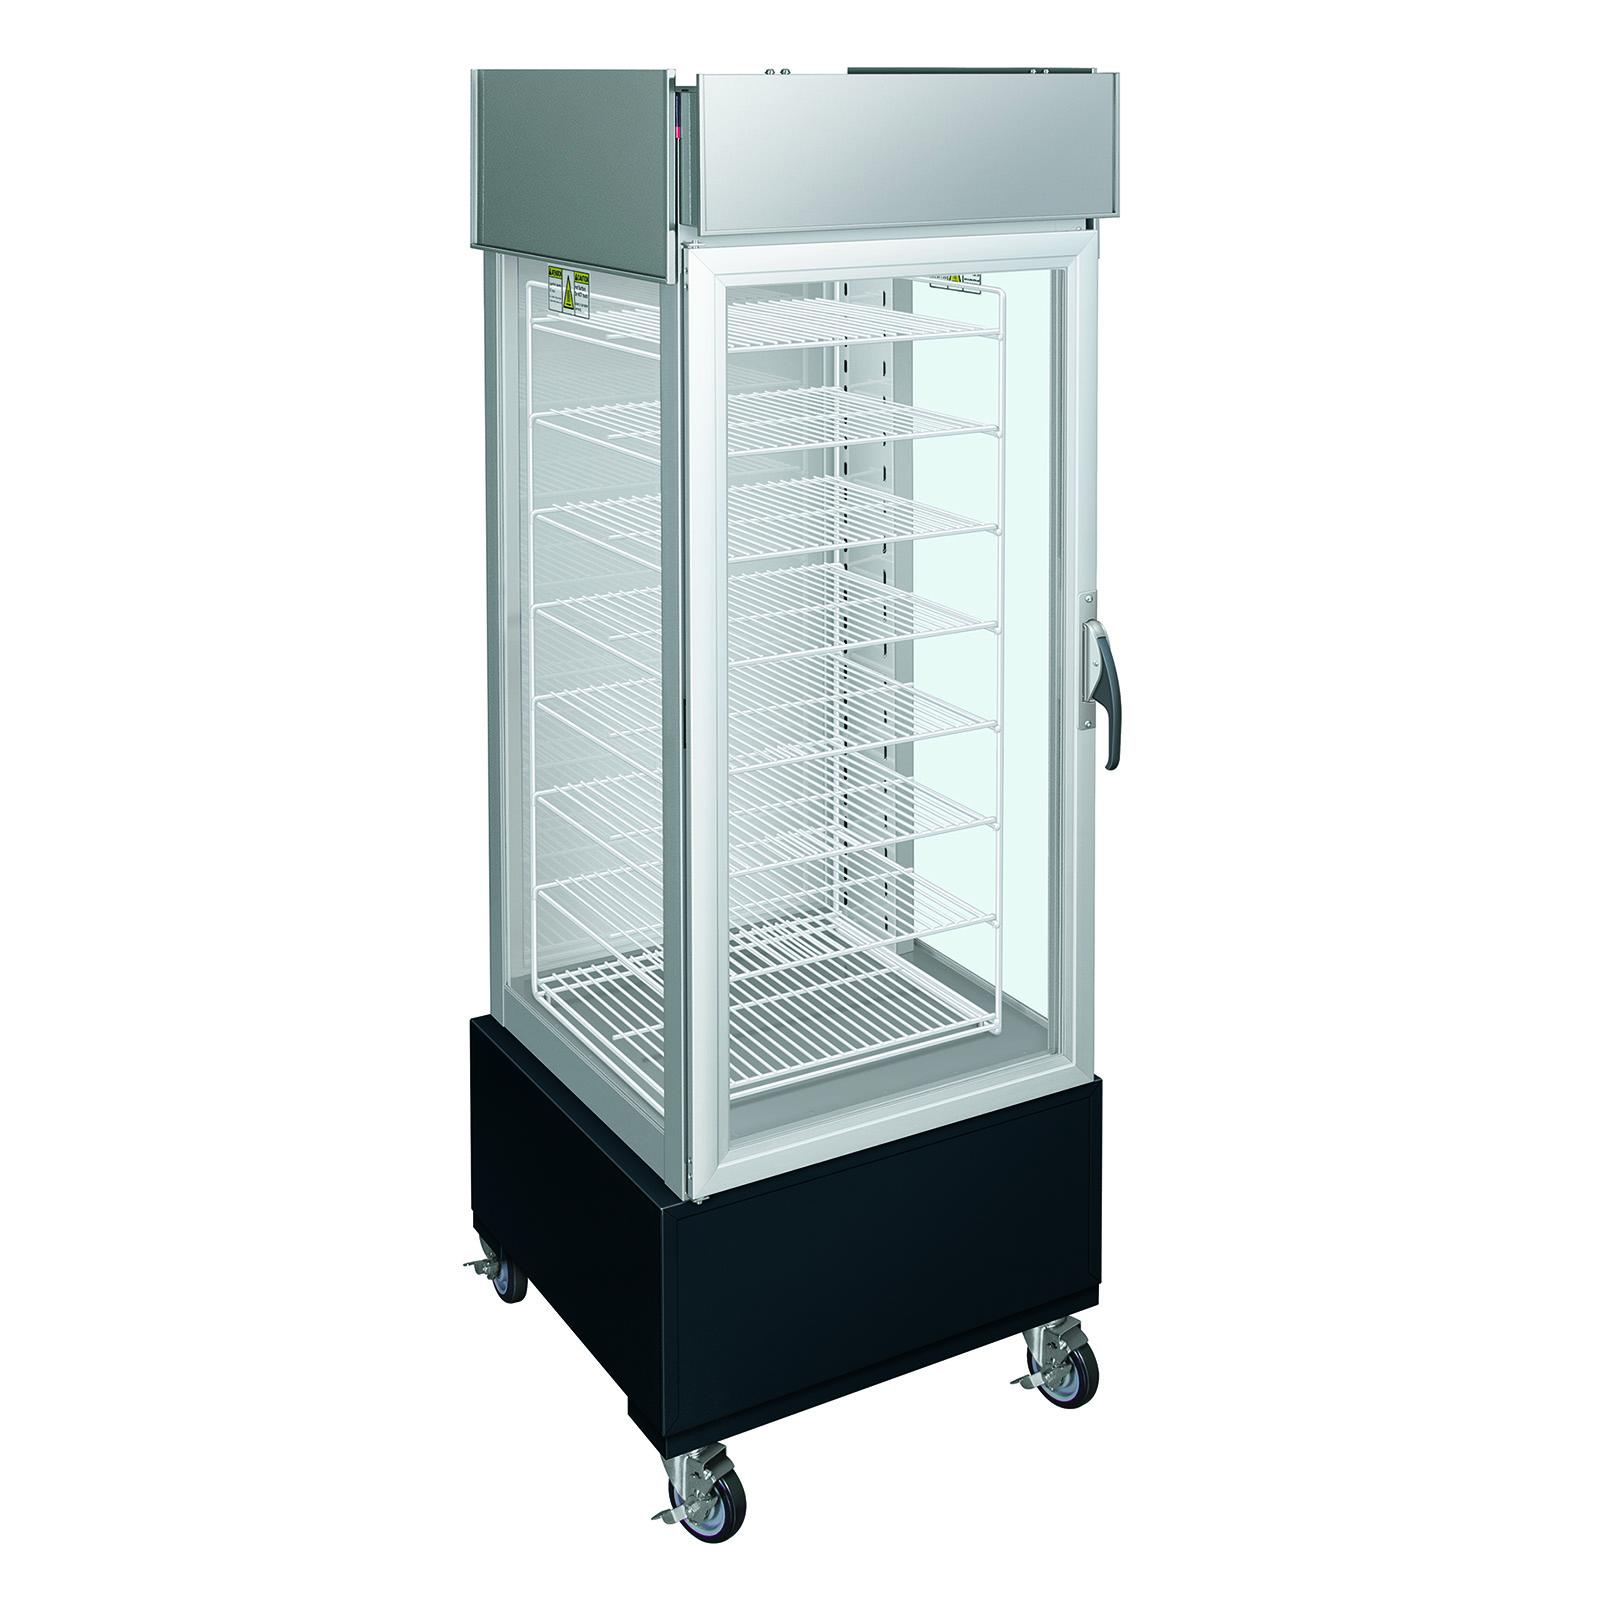 Hatco PFST-1XB display cabinets